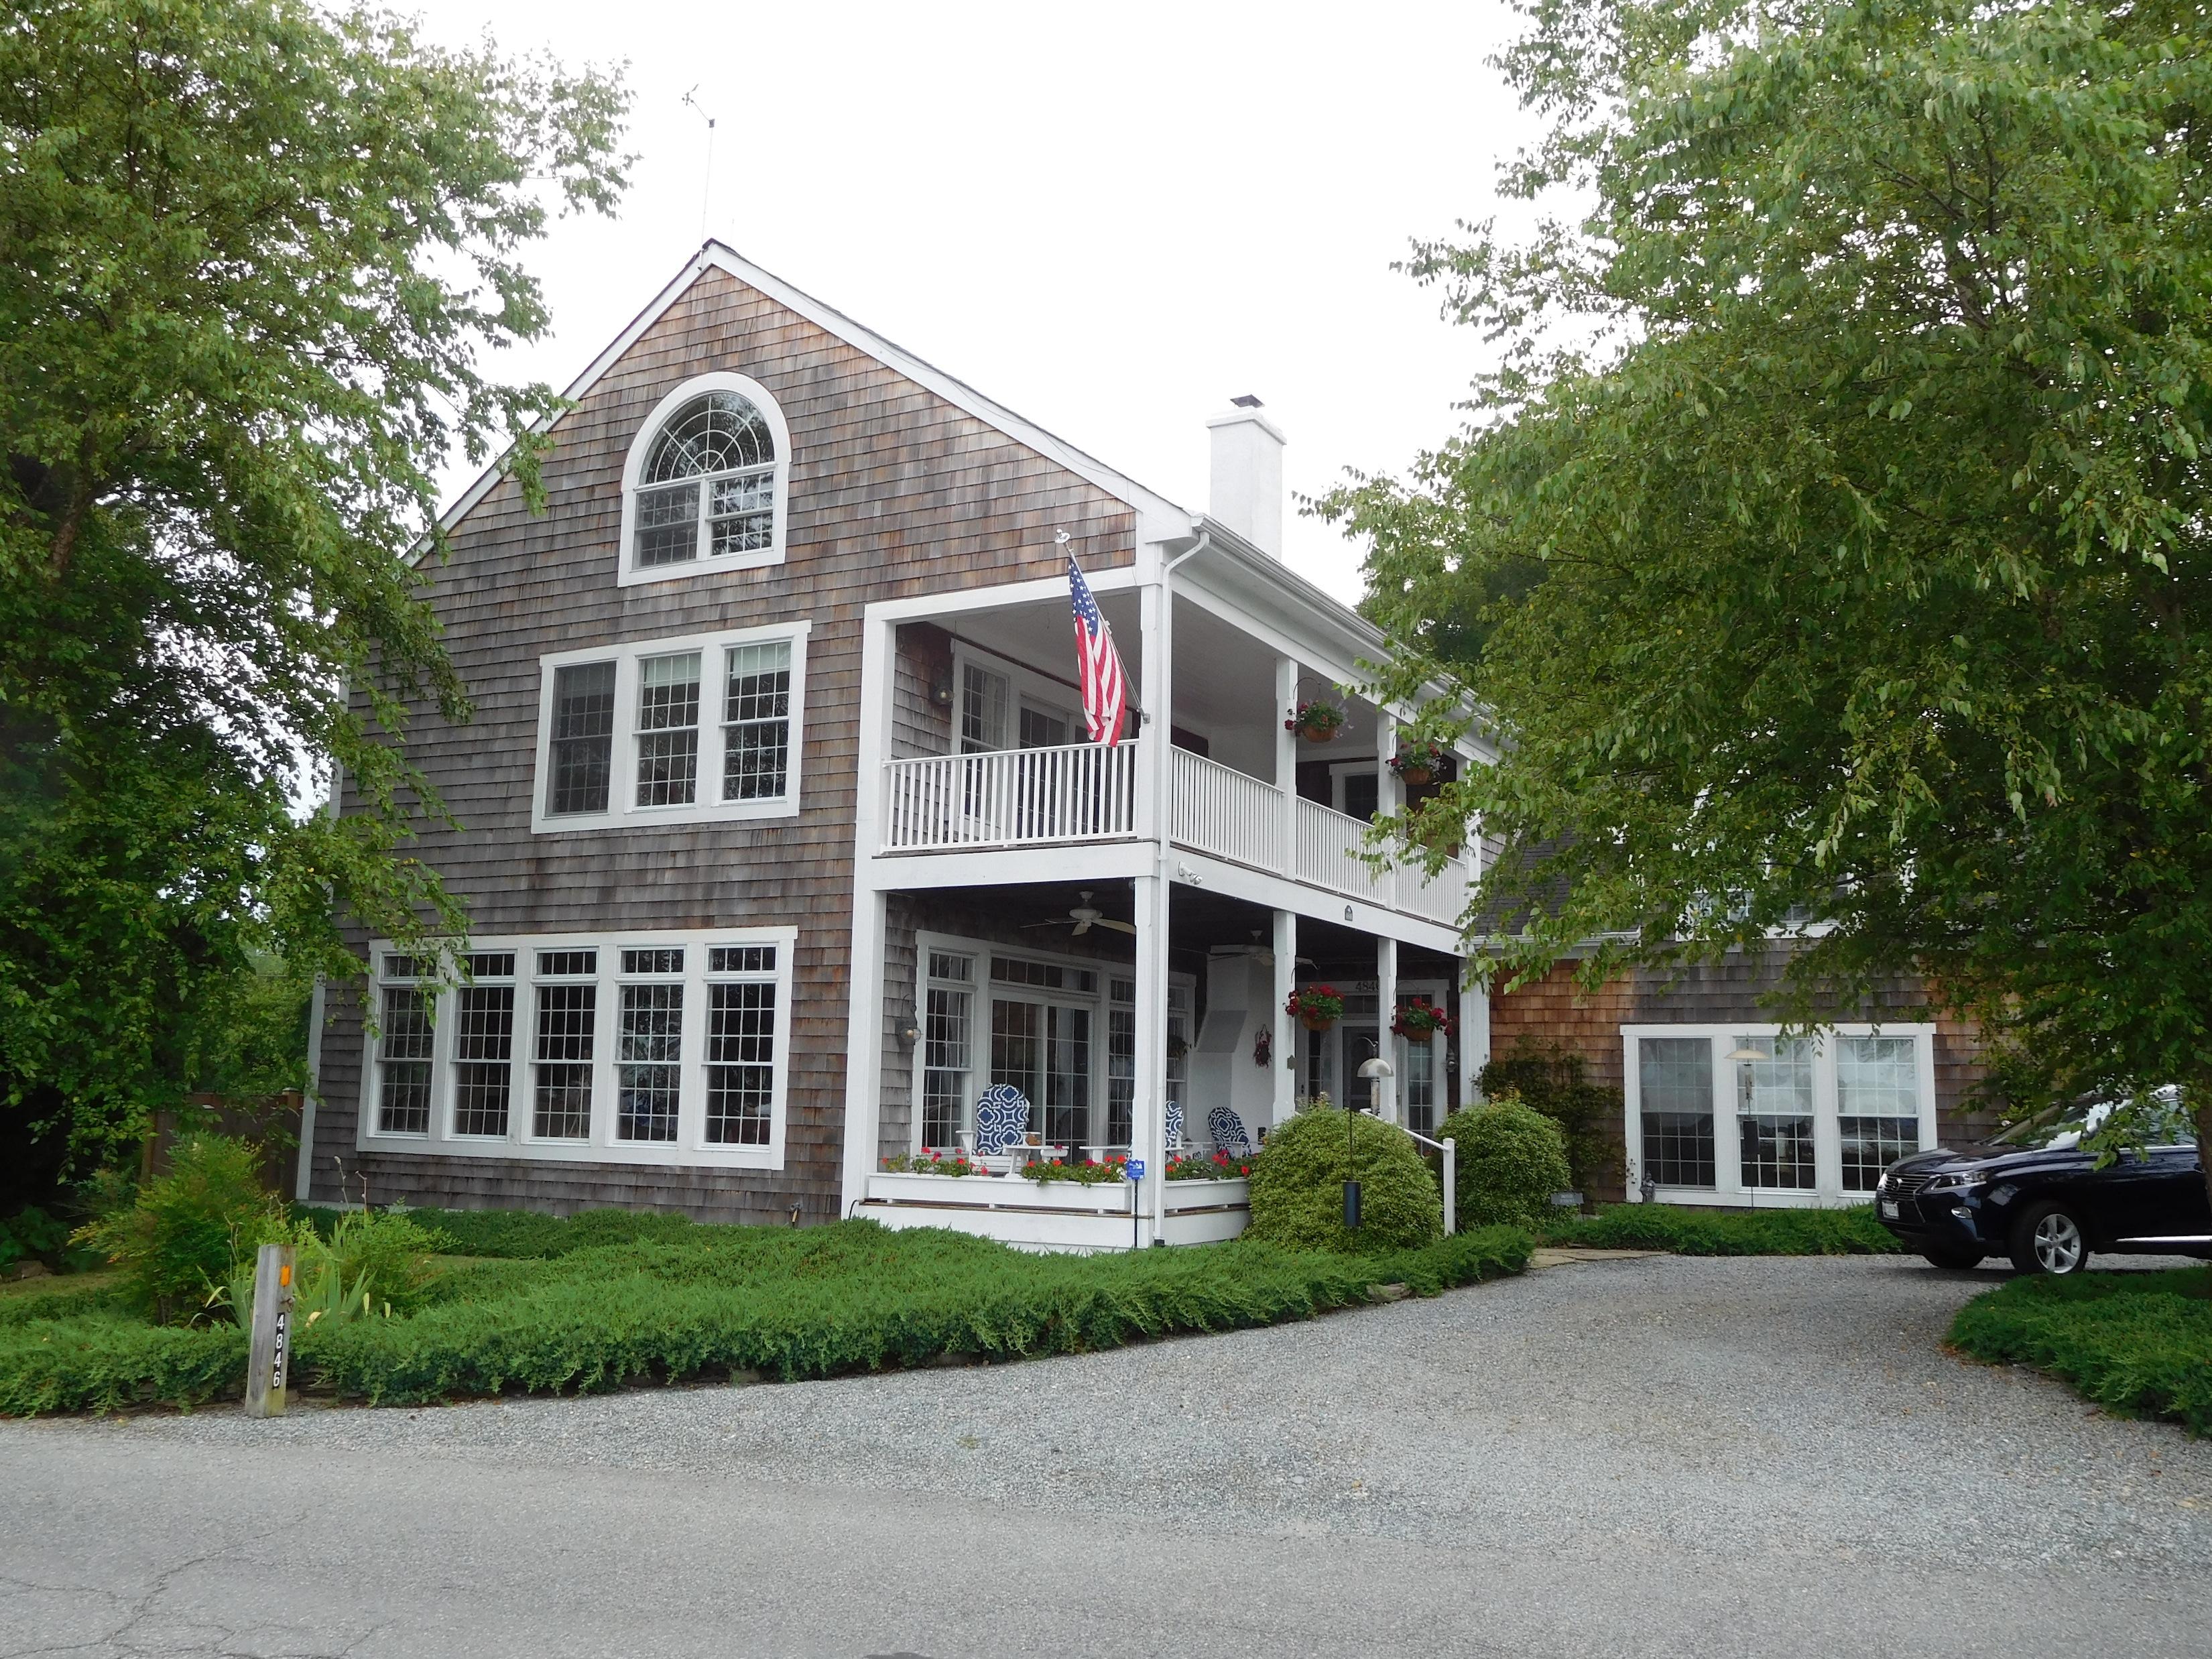 Martie & Leo's home